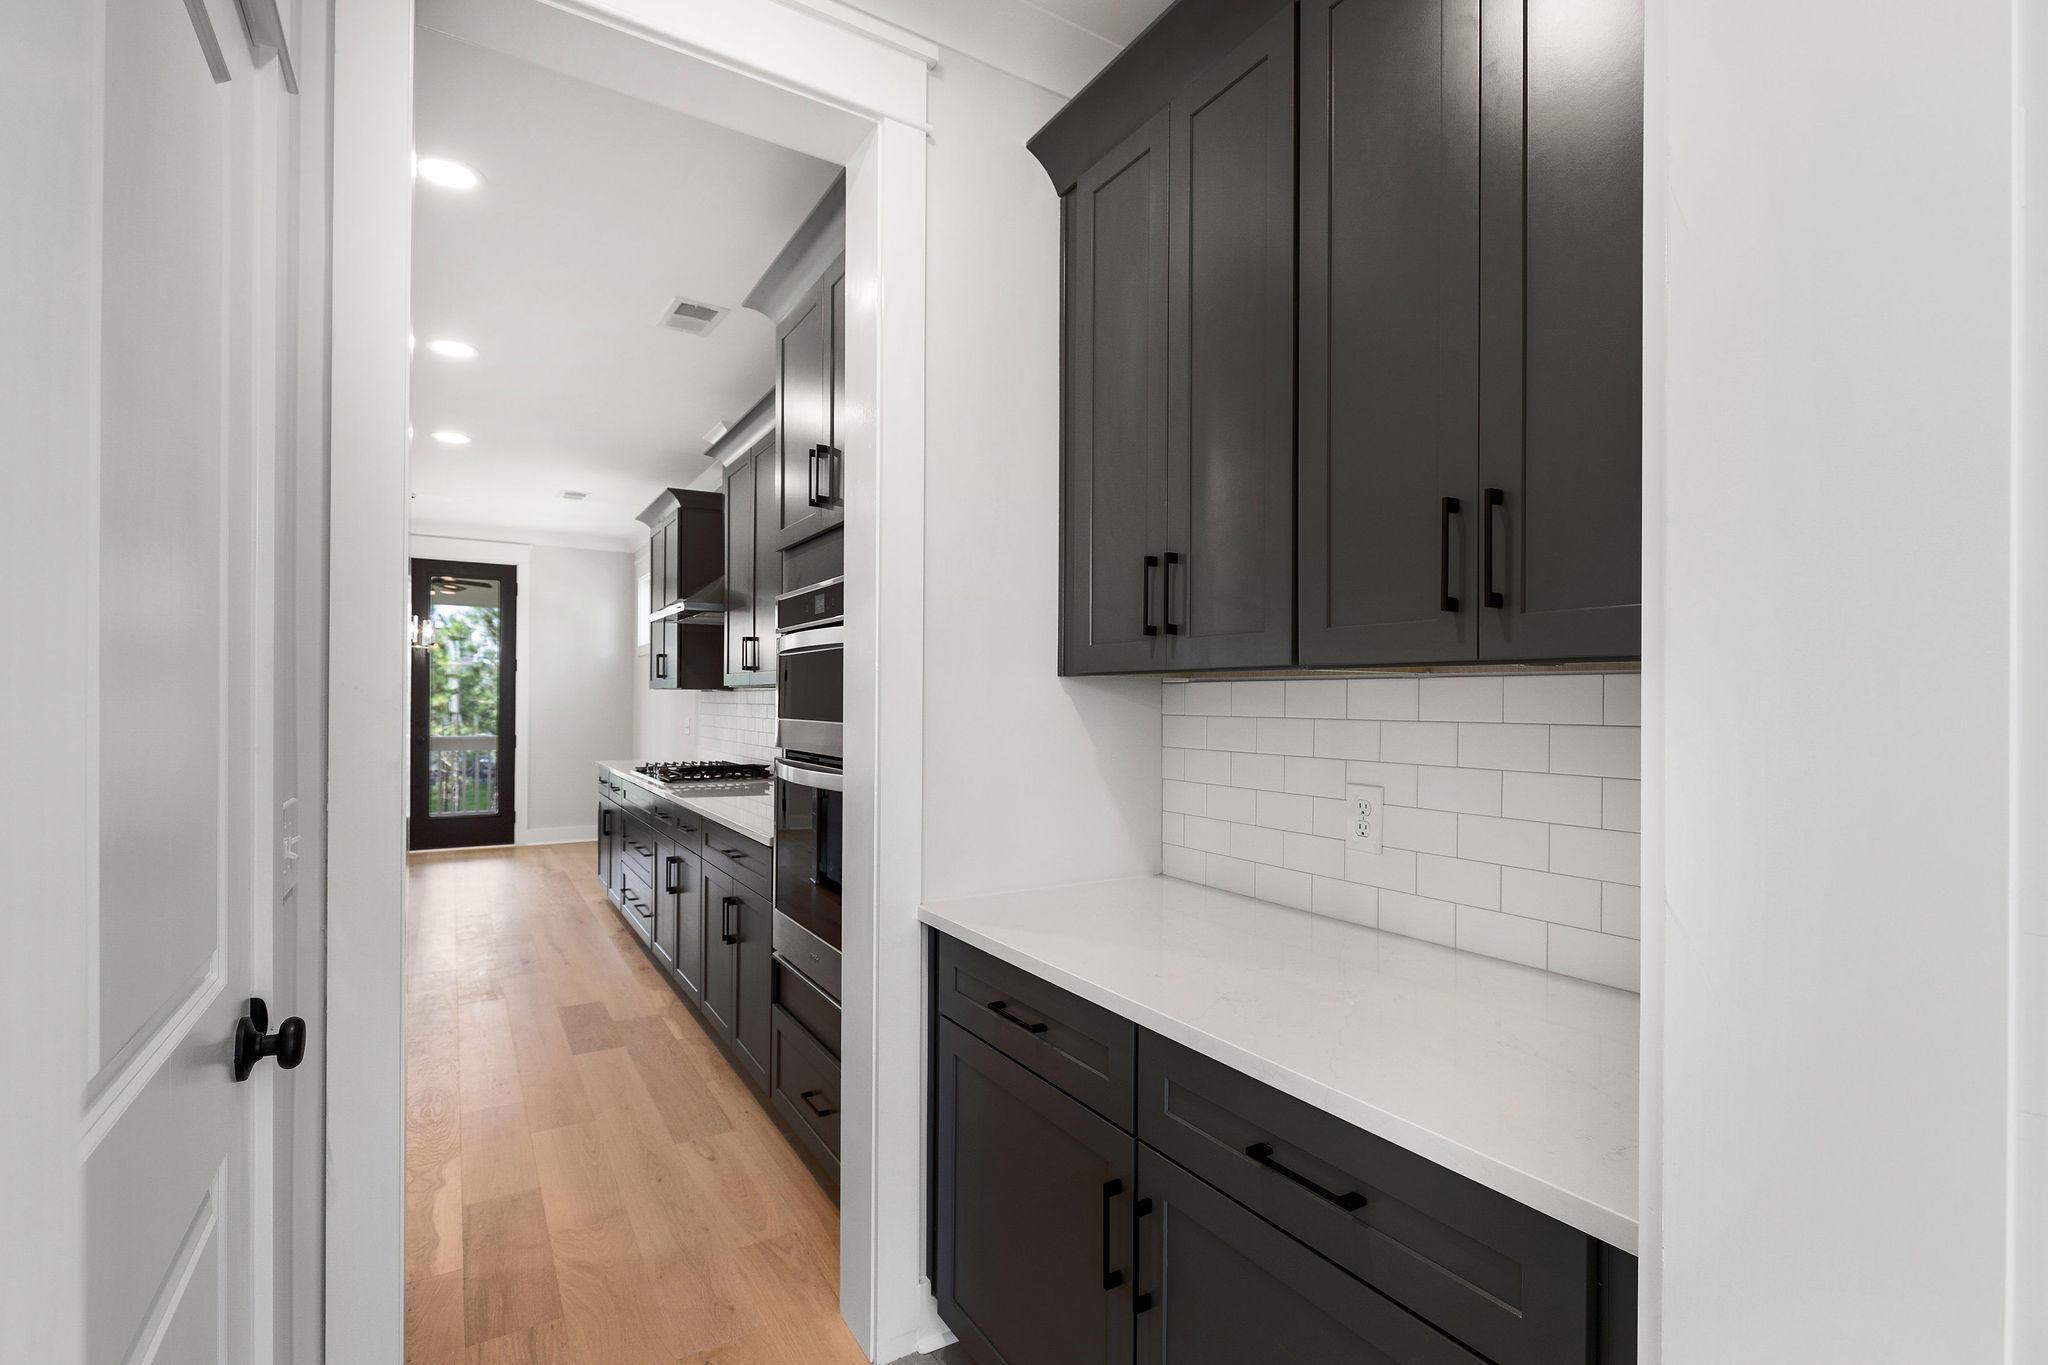 Park West Homes For Sale - 2291 Middlesex, Mount Pleasant, SC - 69